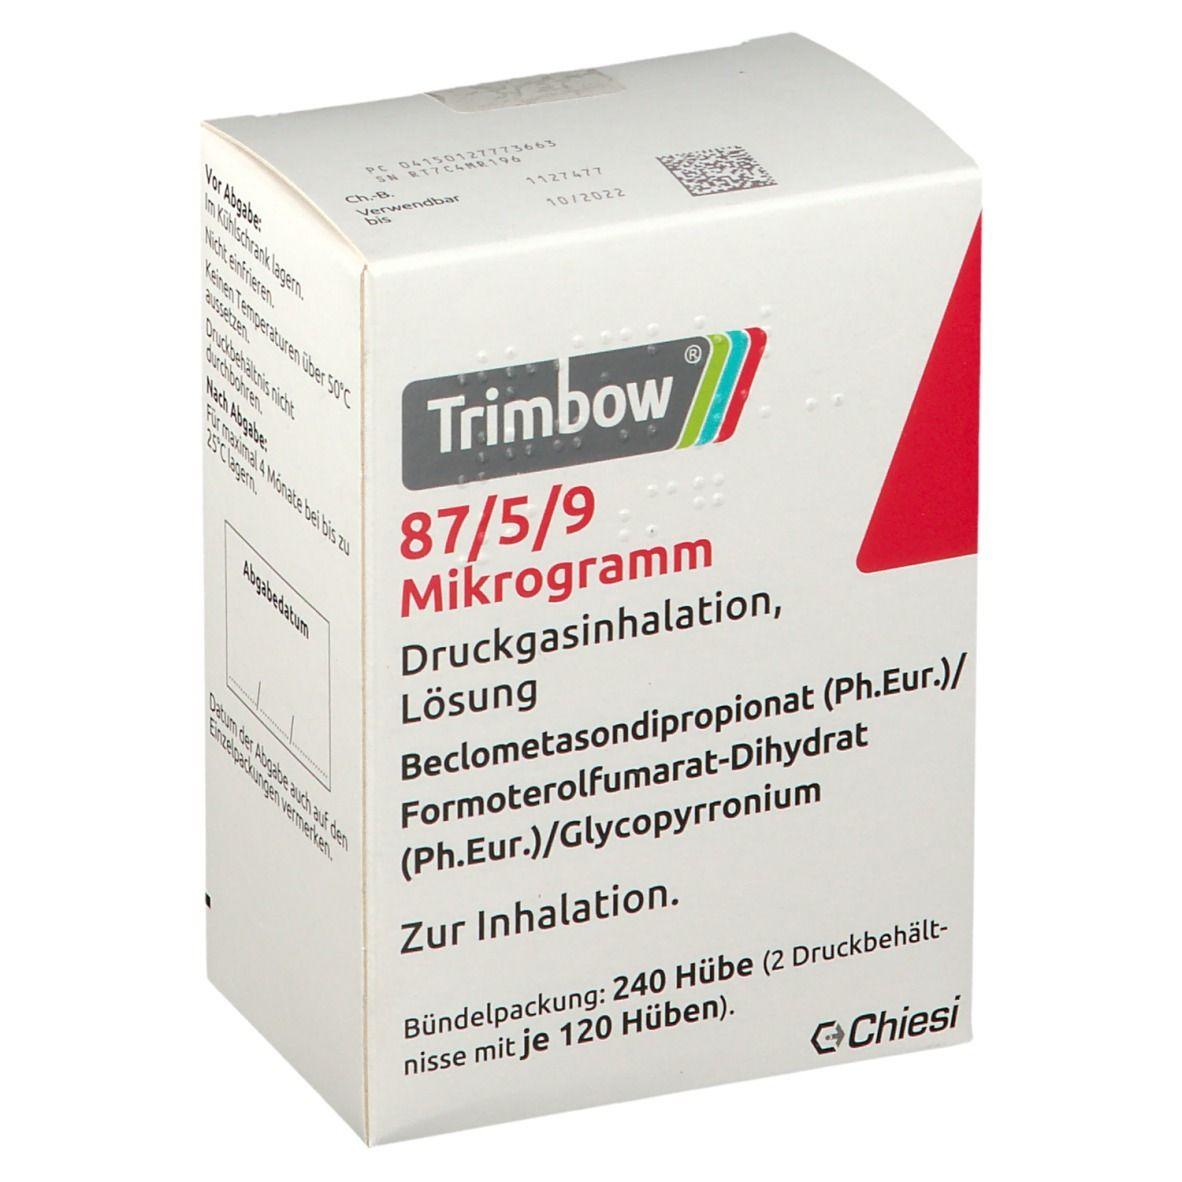 TRIMBOW 87 µg/5 µg/9 µg 120 Hub Druckgasinhalation